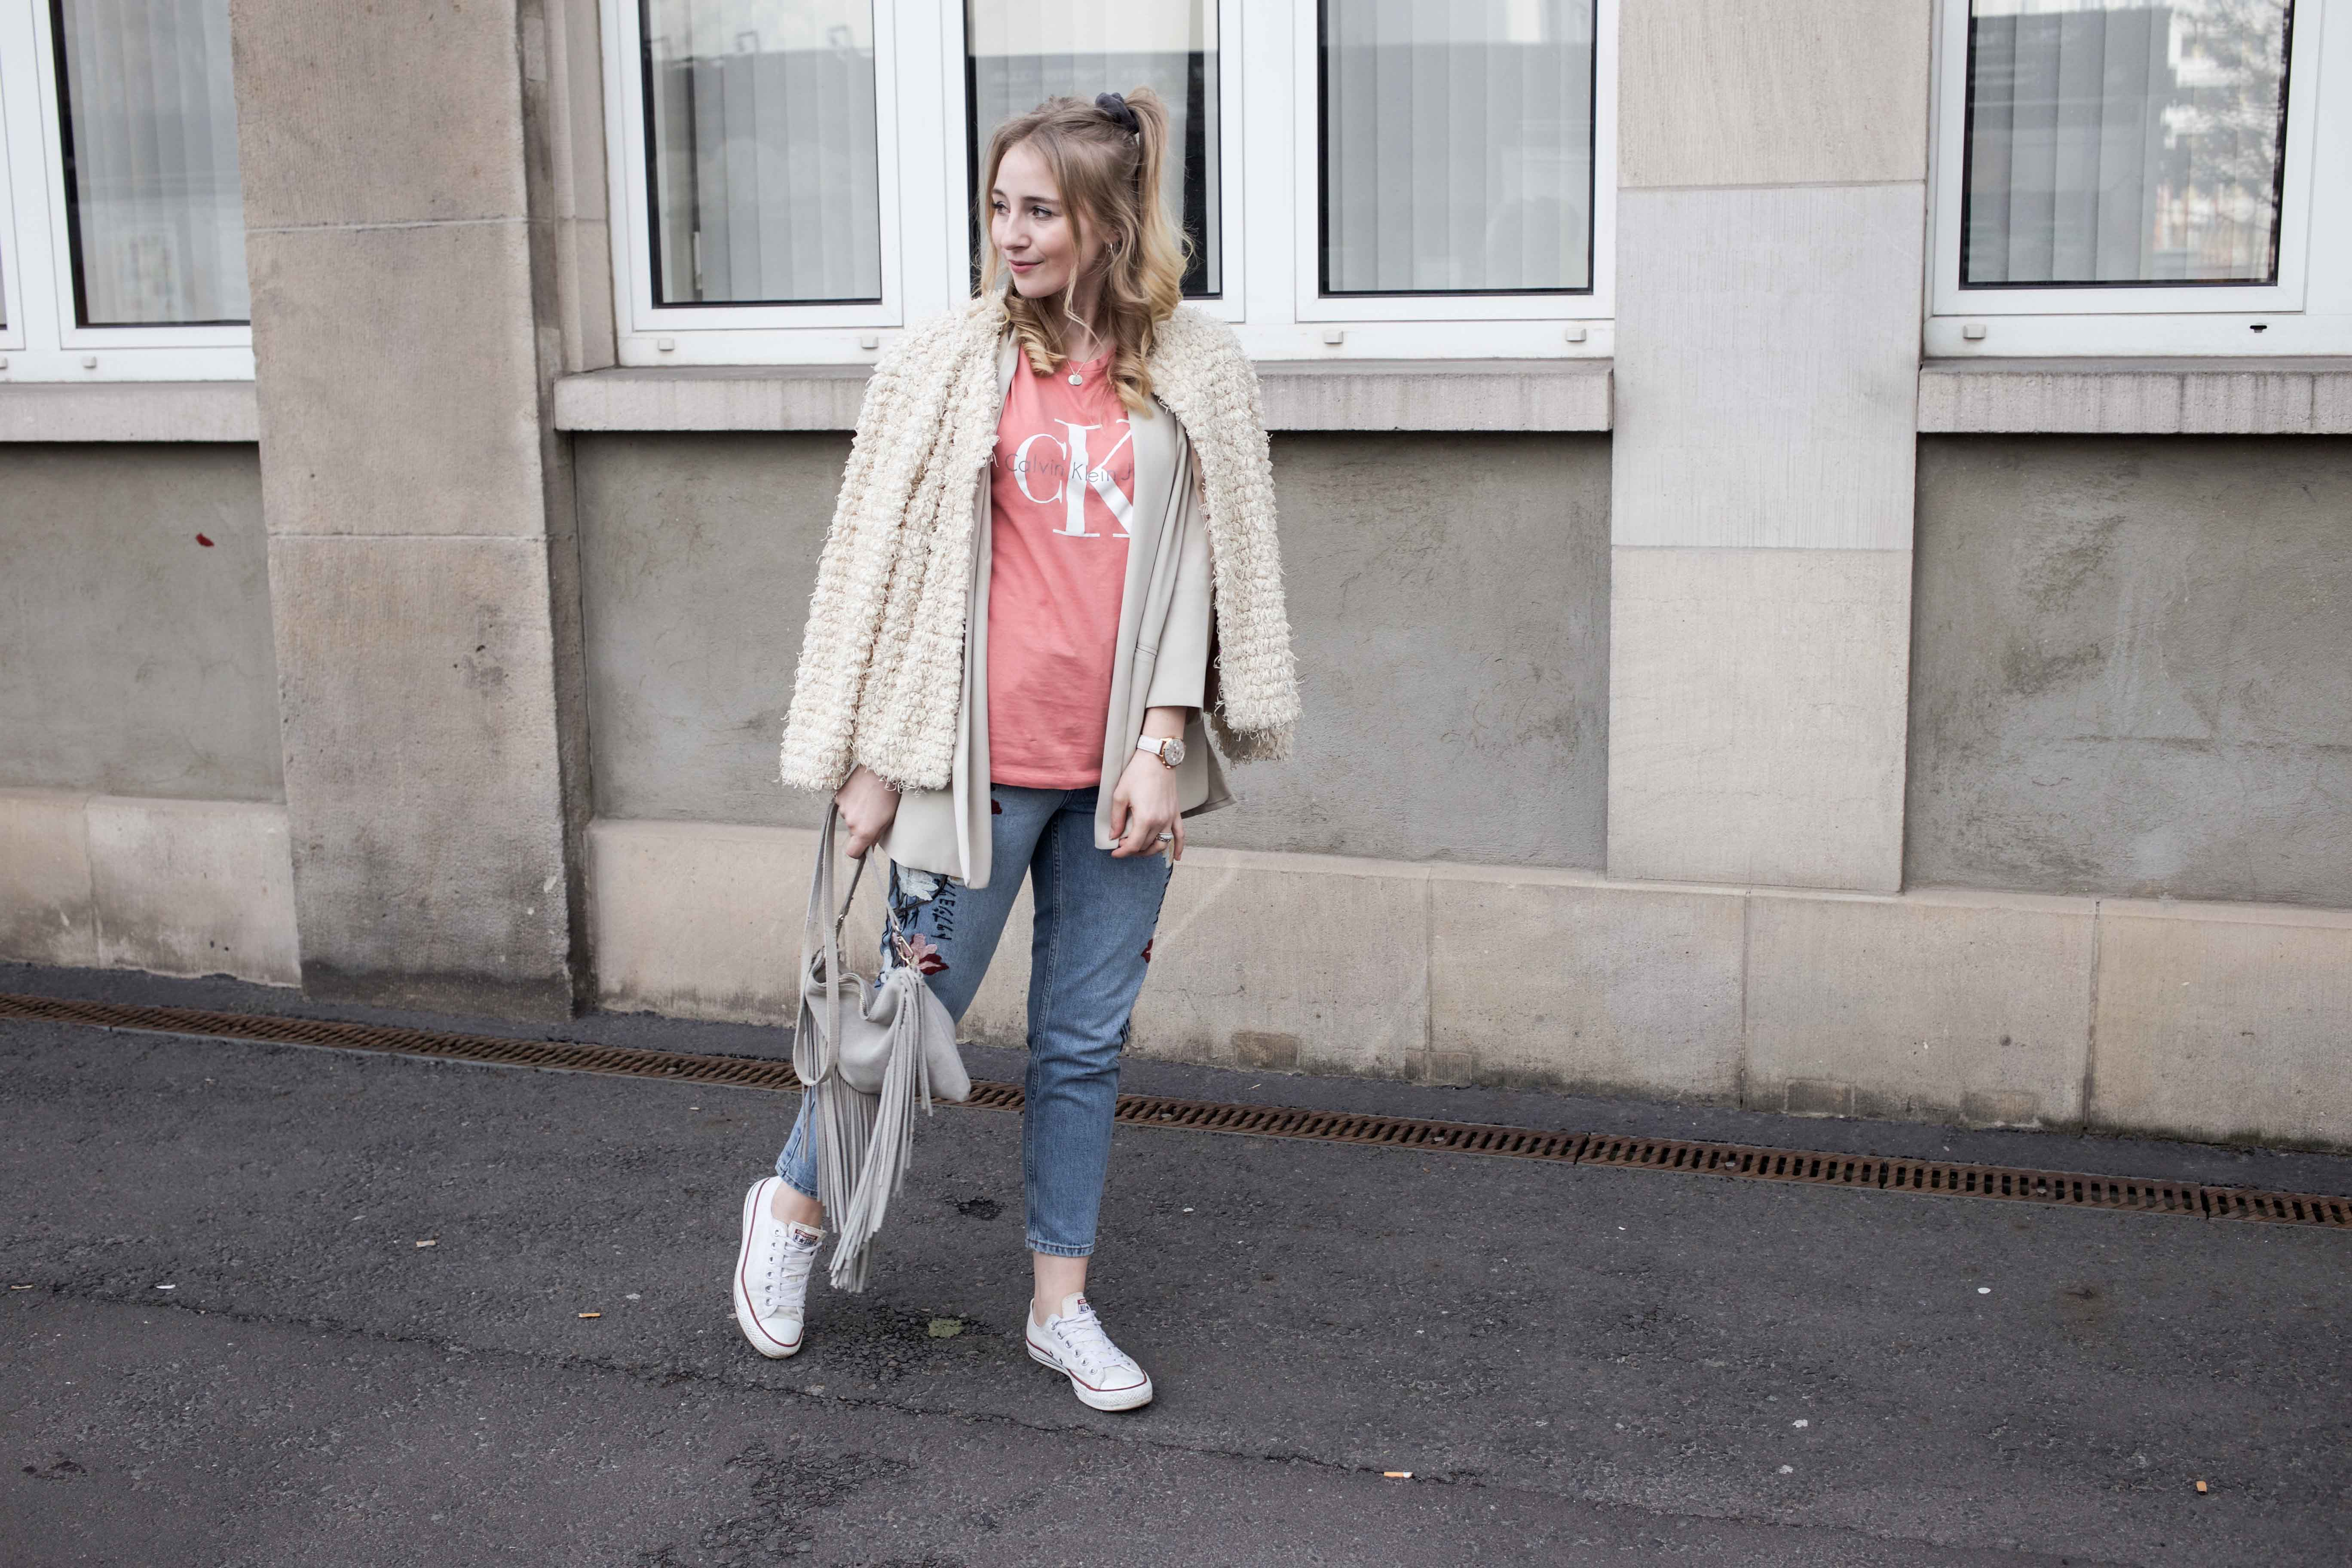 Frühlingslook-Berlin-Mom-Jeans-Blumenprint-Fashionblog-Blogger-Calvin-Klein-Tshirt-streetstyle_4695